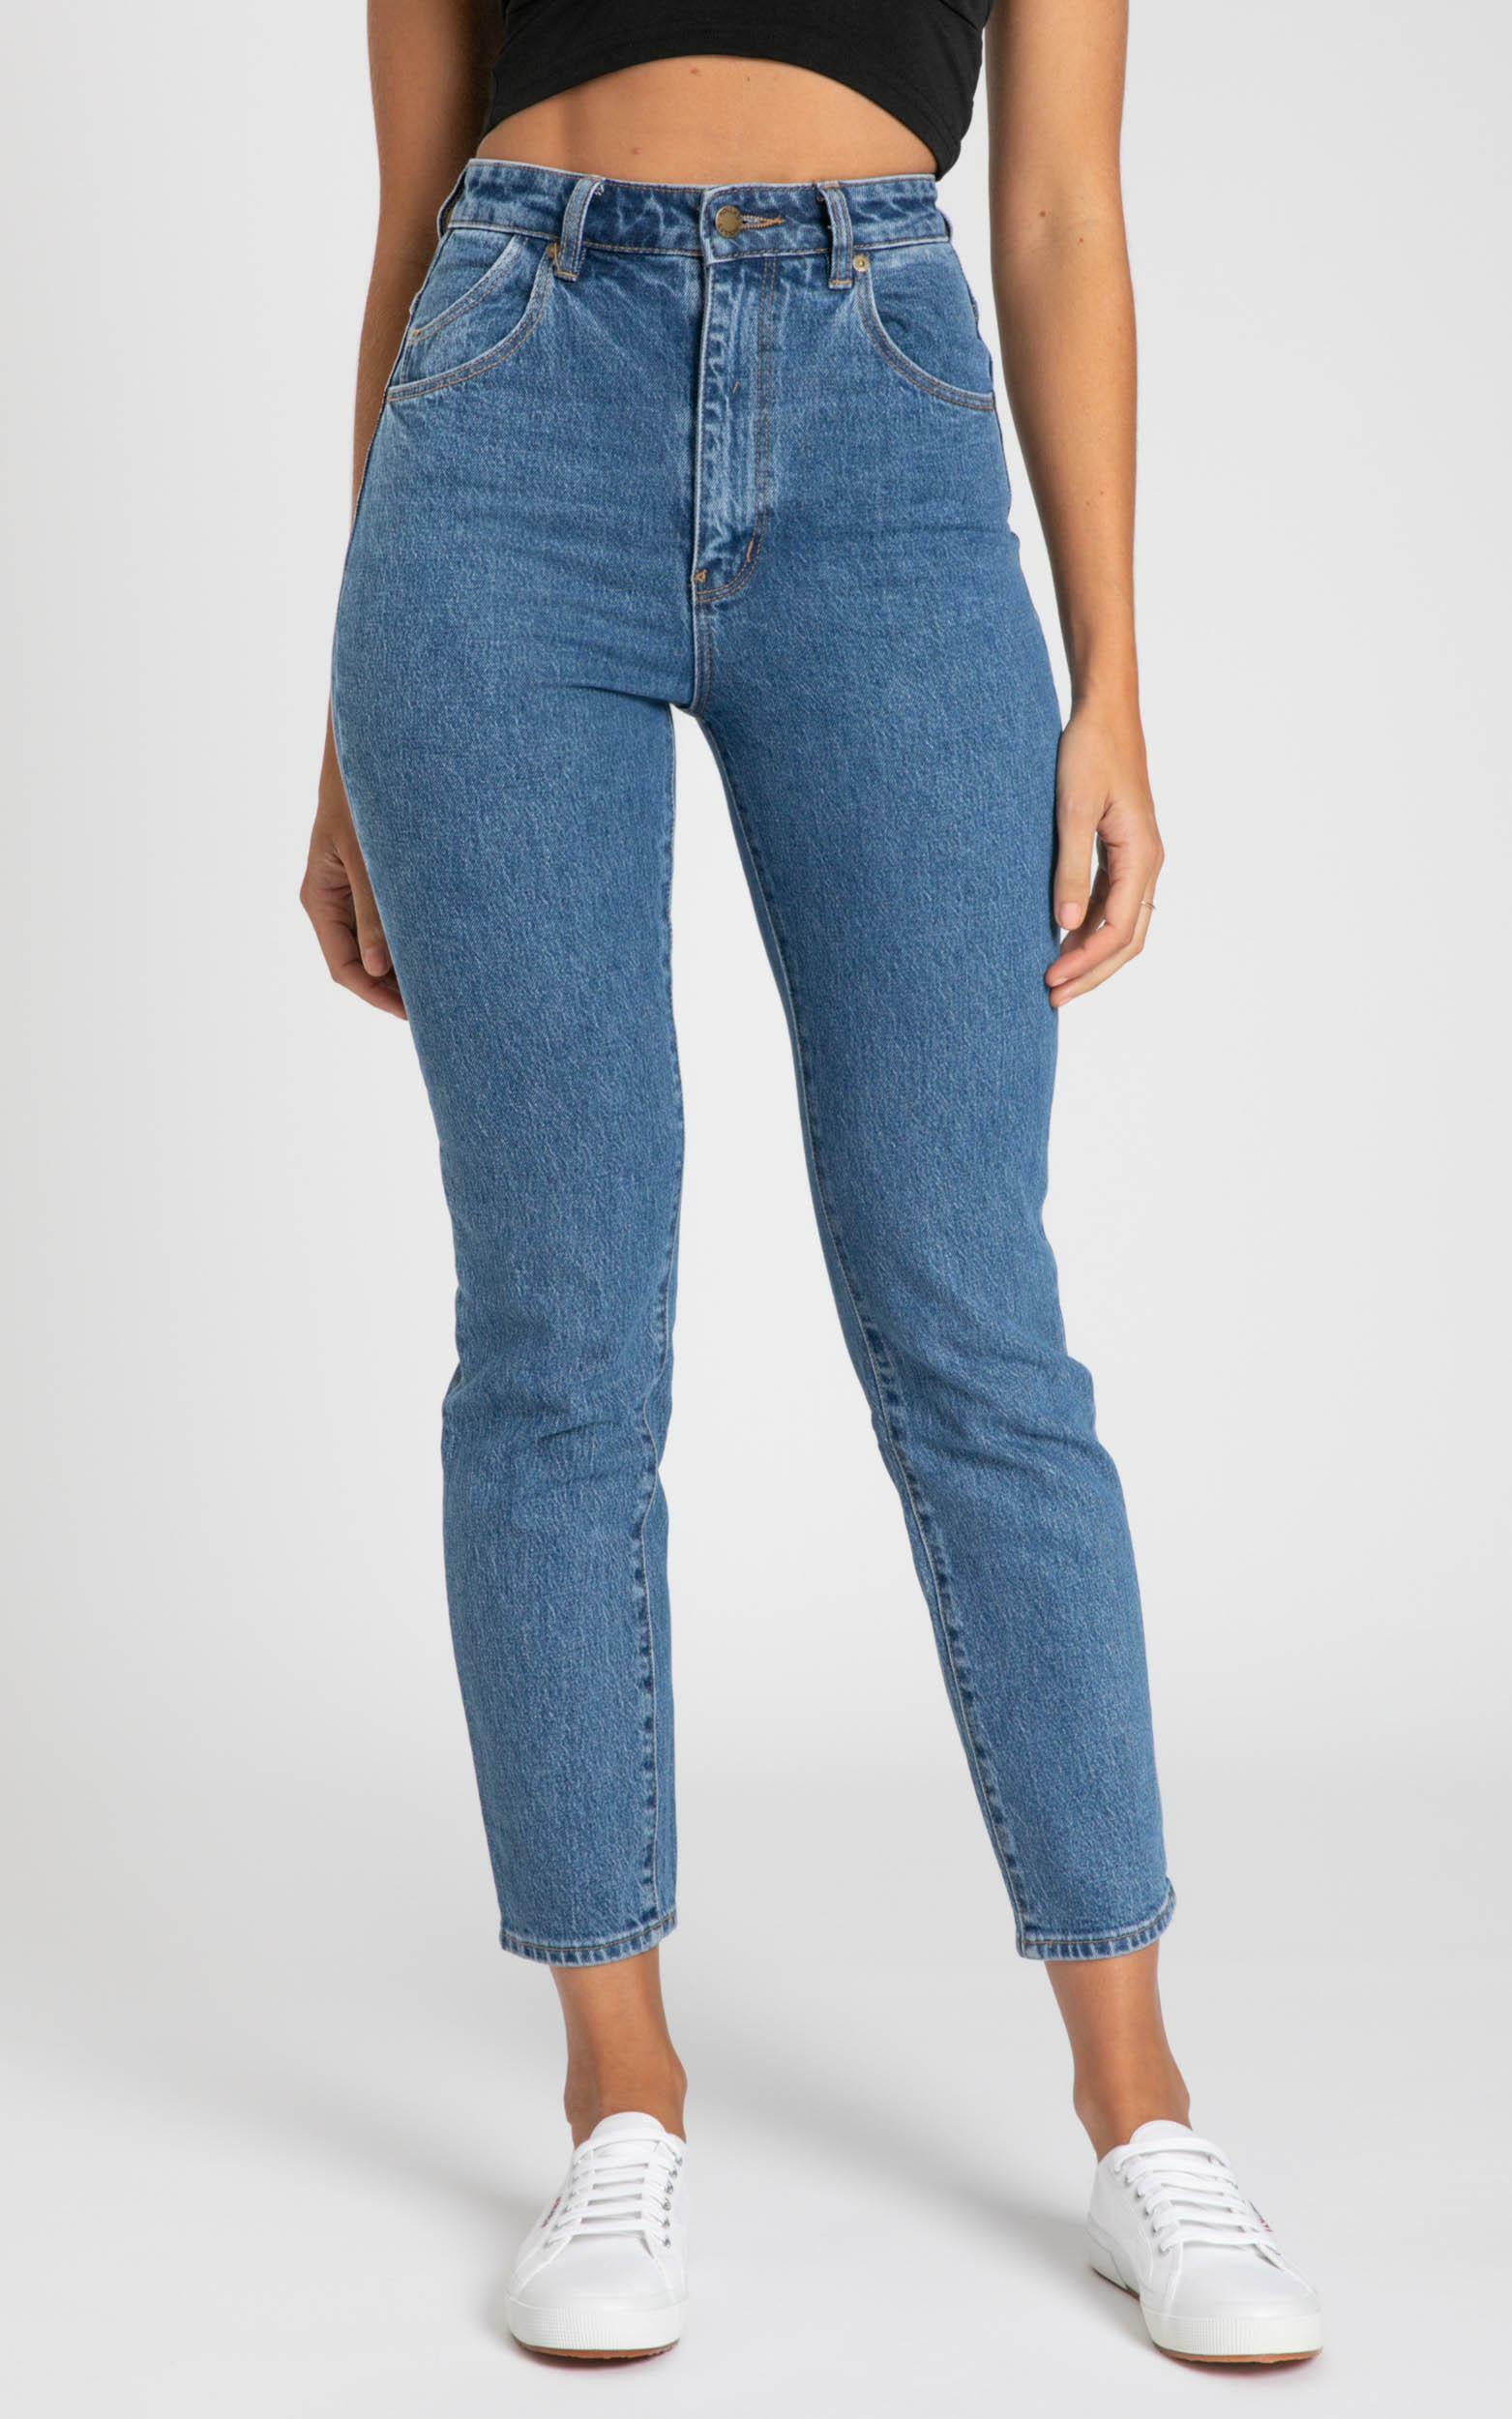 Rollas - Dusters Jeans in sadie blue - 6 (XS), Blue, hi-res image number null